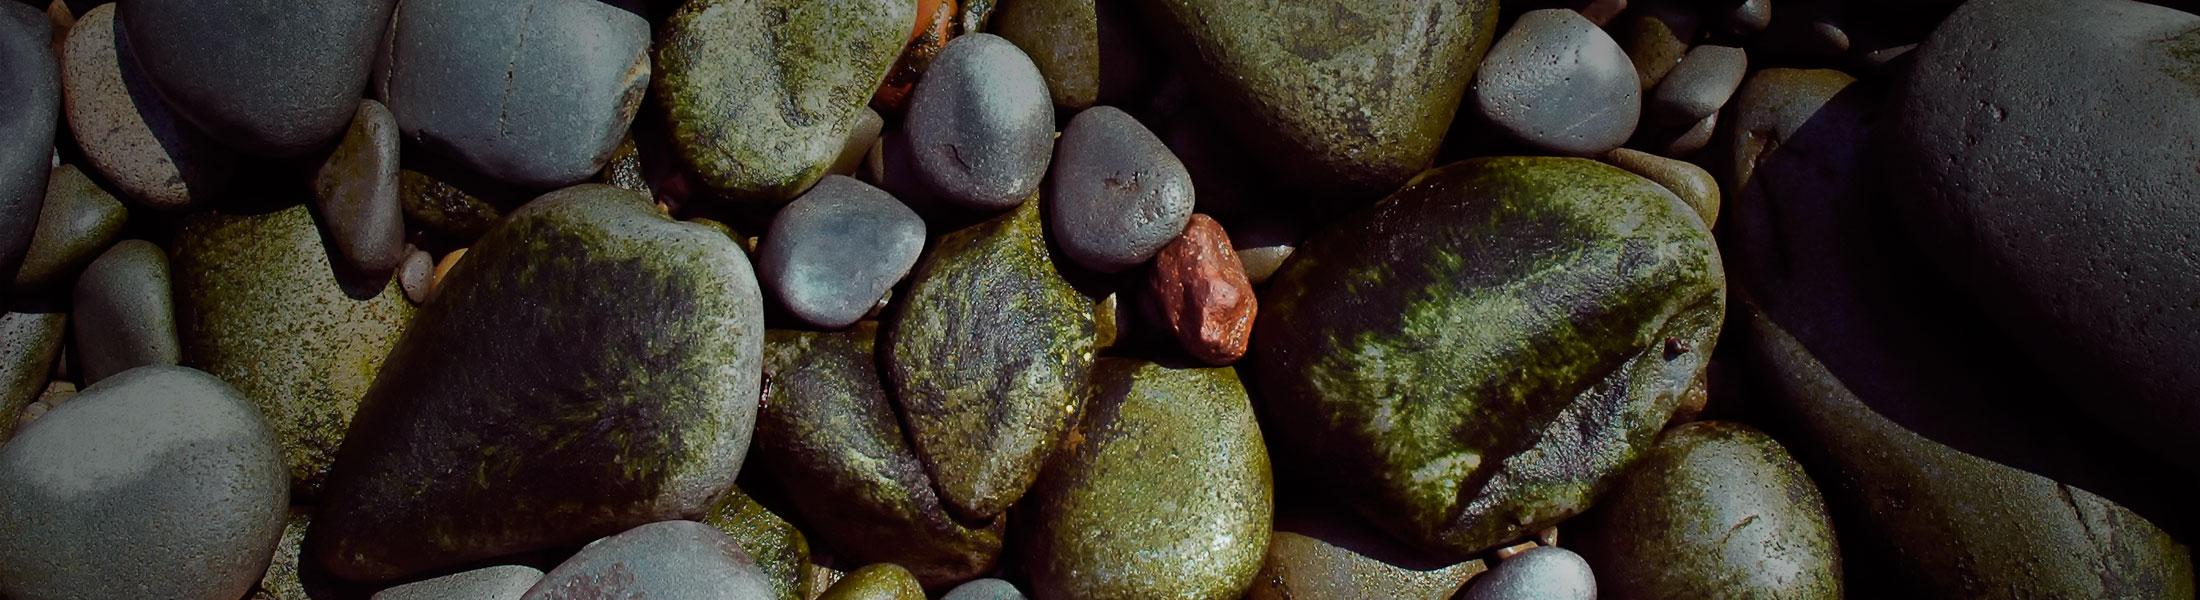 parallax-banner_rocks1